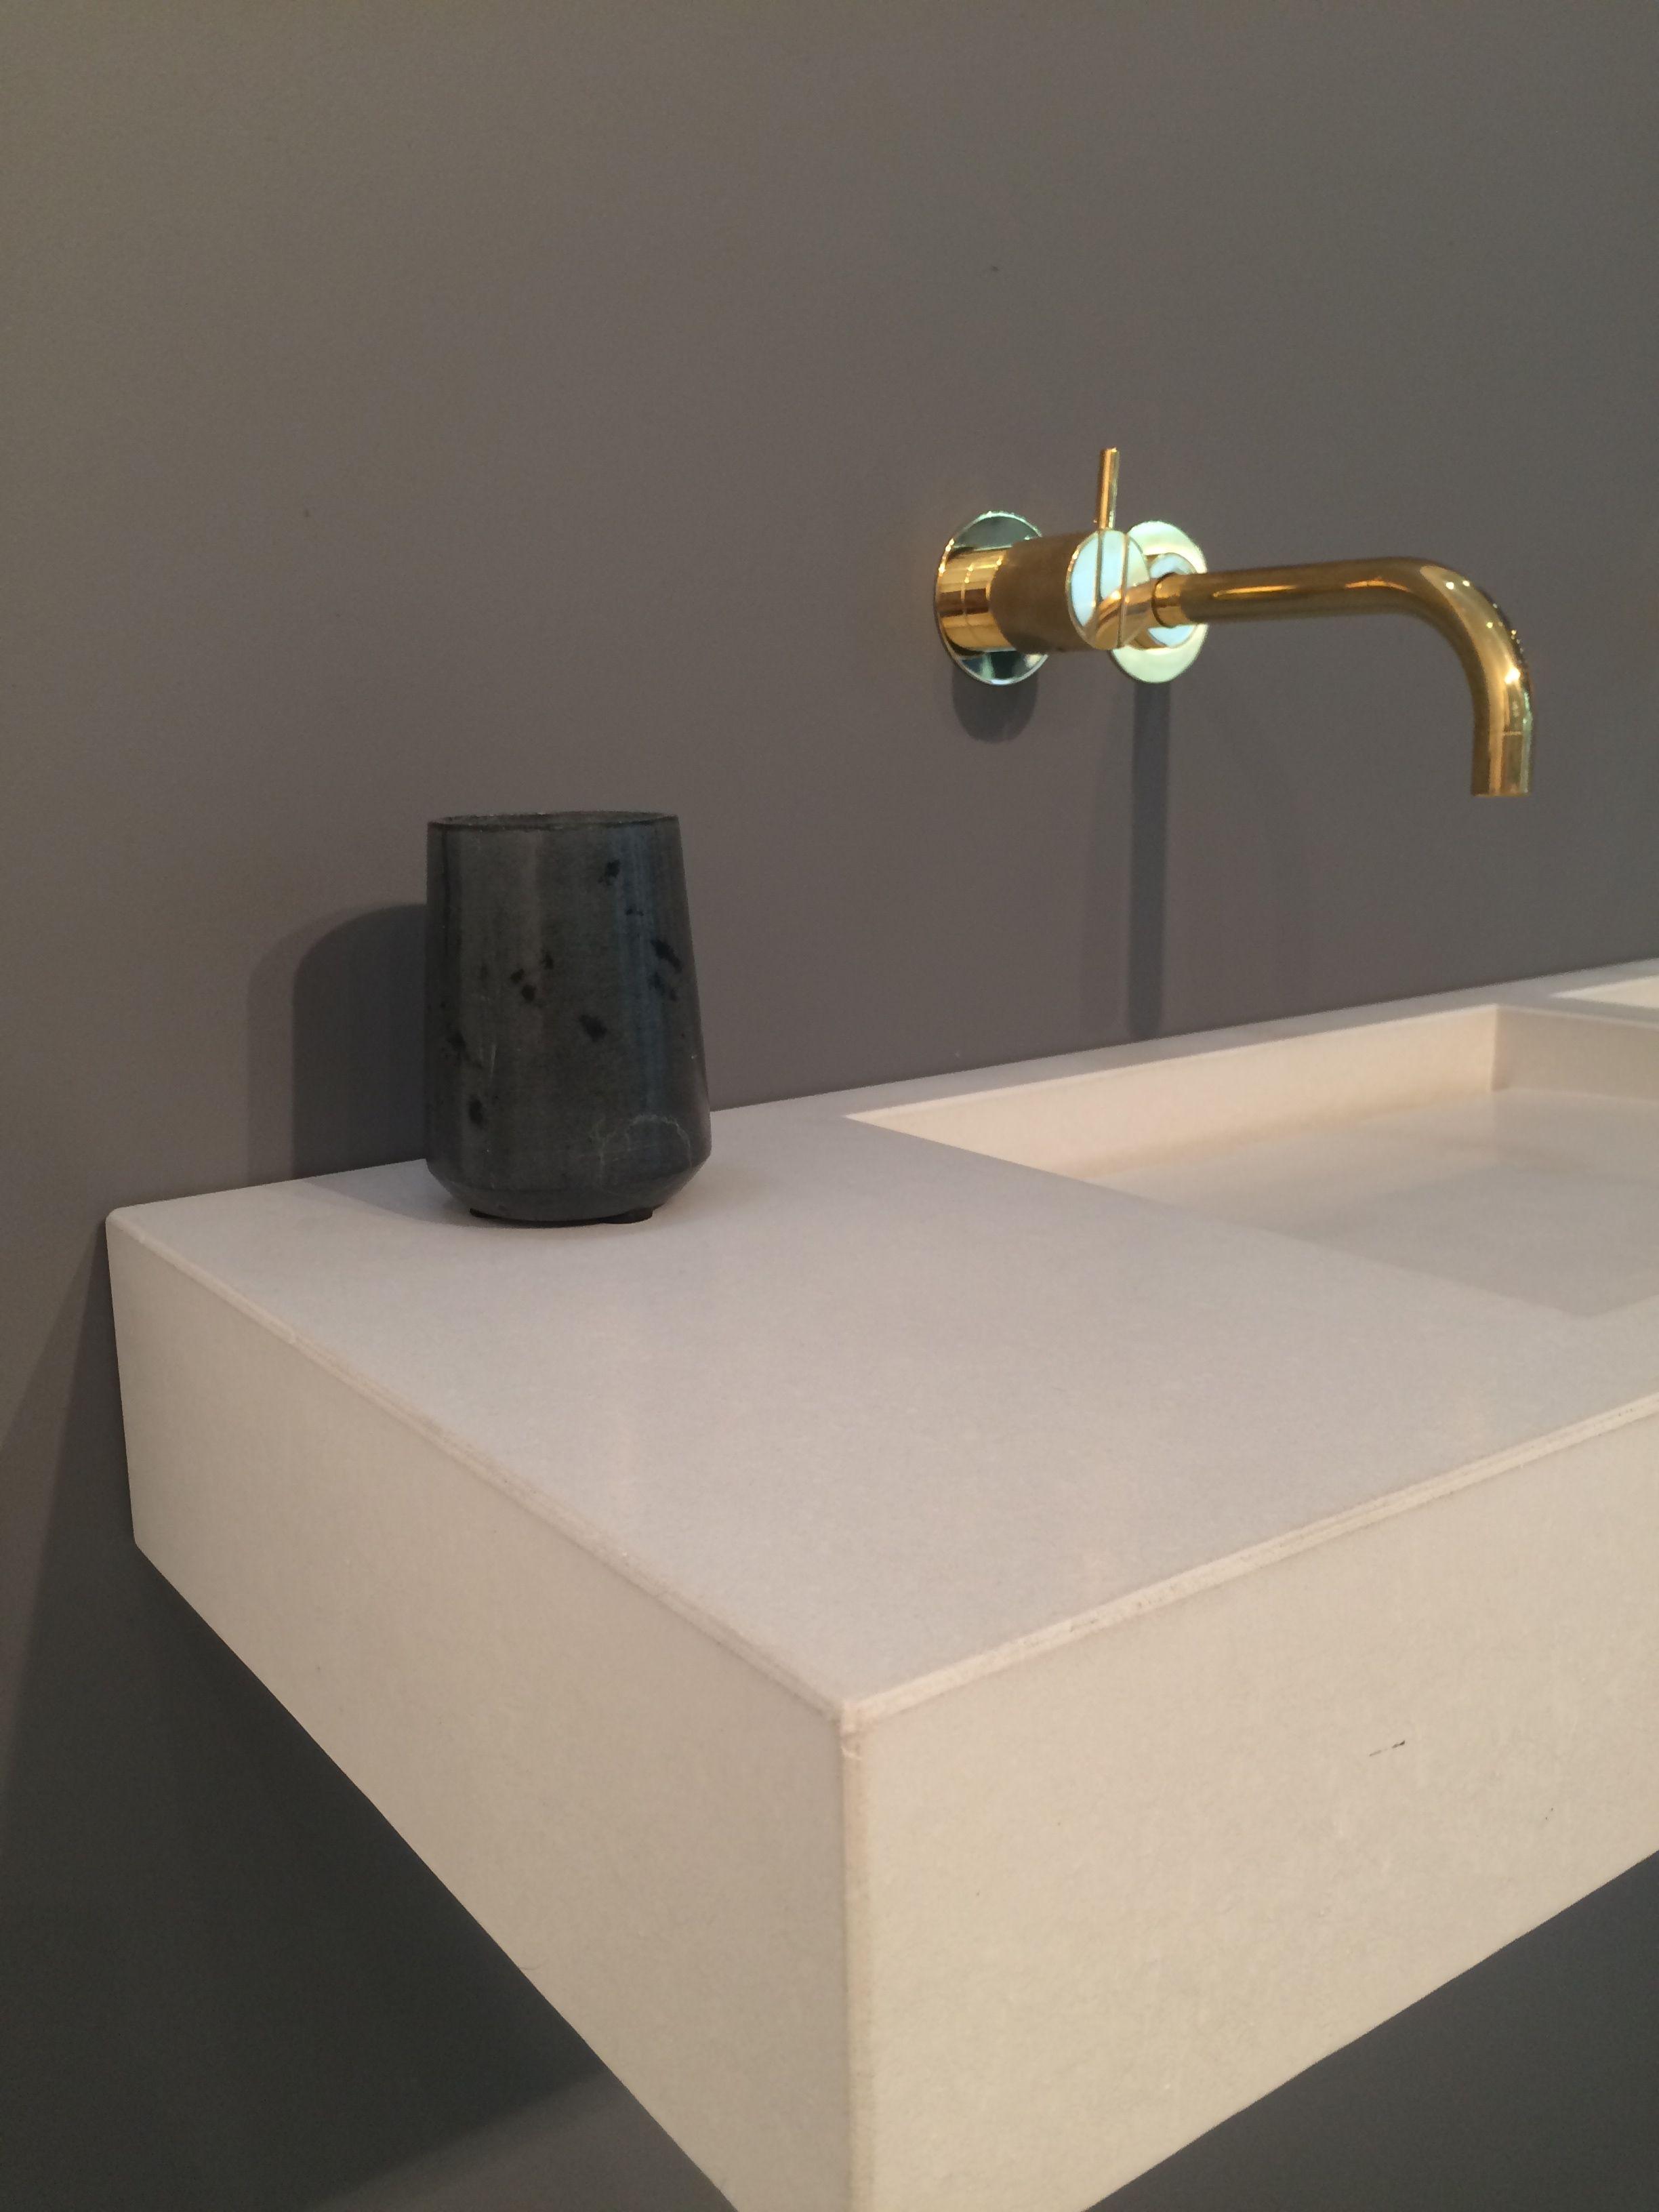 Custom basin designed with hidden runaway drainage by Kast